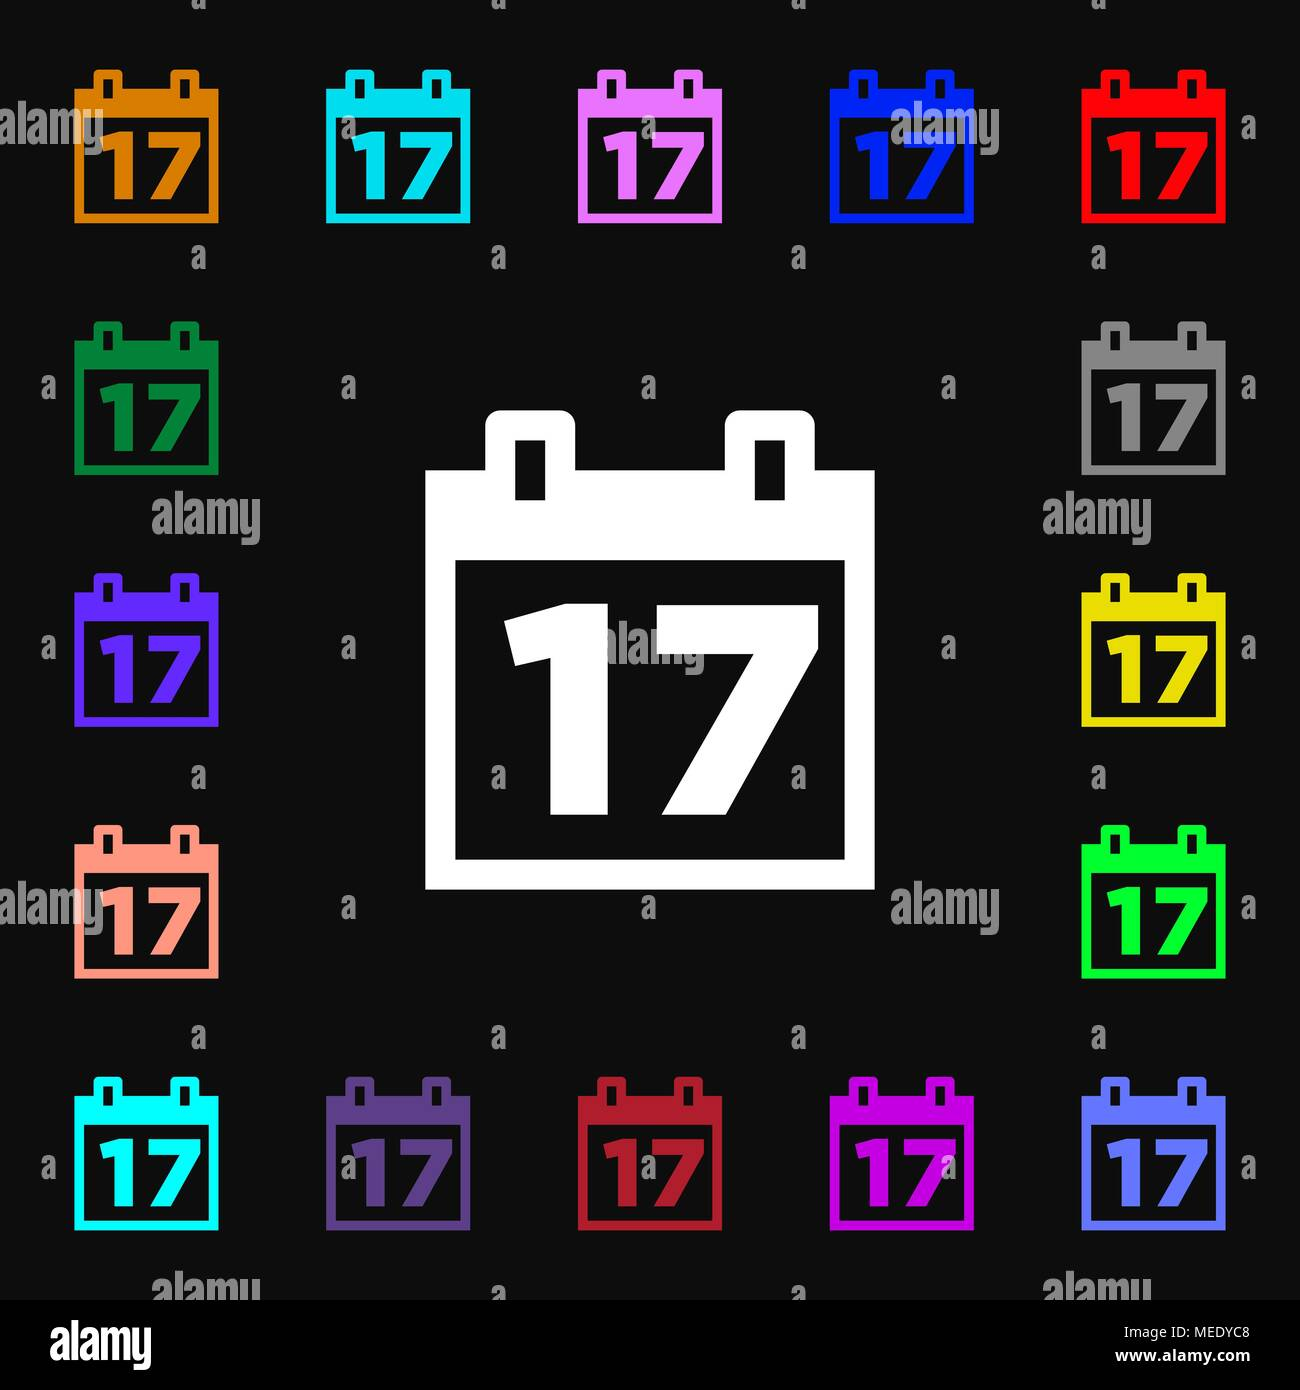 Simboli Luna Calendario.Calendario Data O Un Promemoria Evento Icona Segno Tanti I